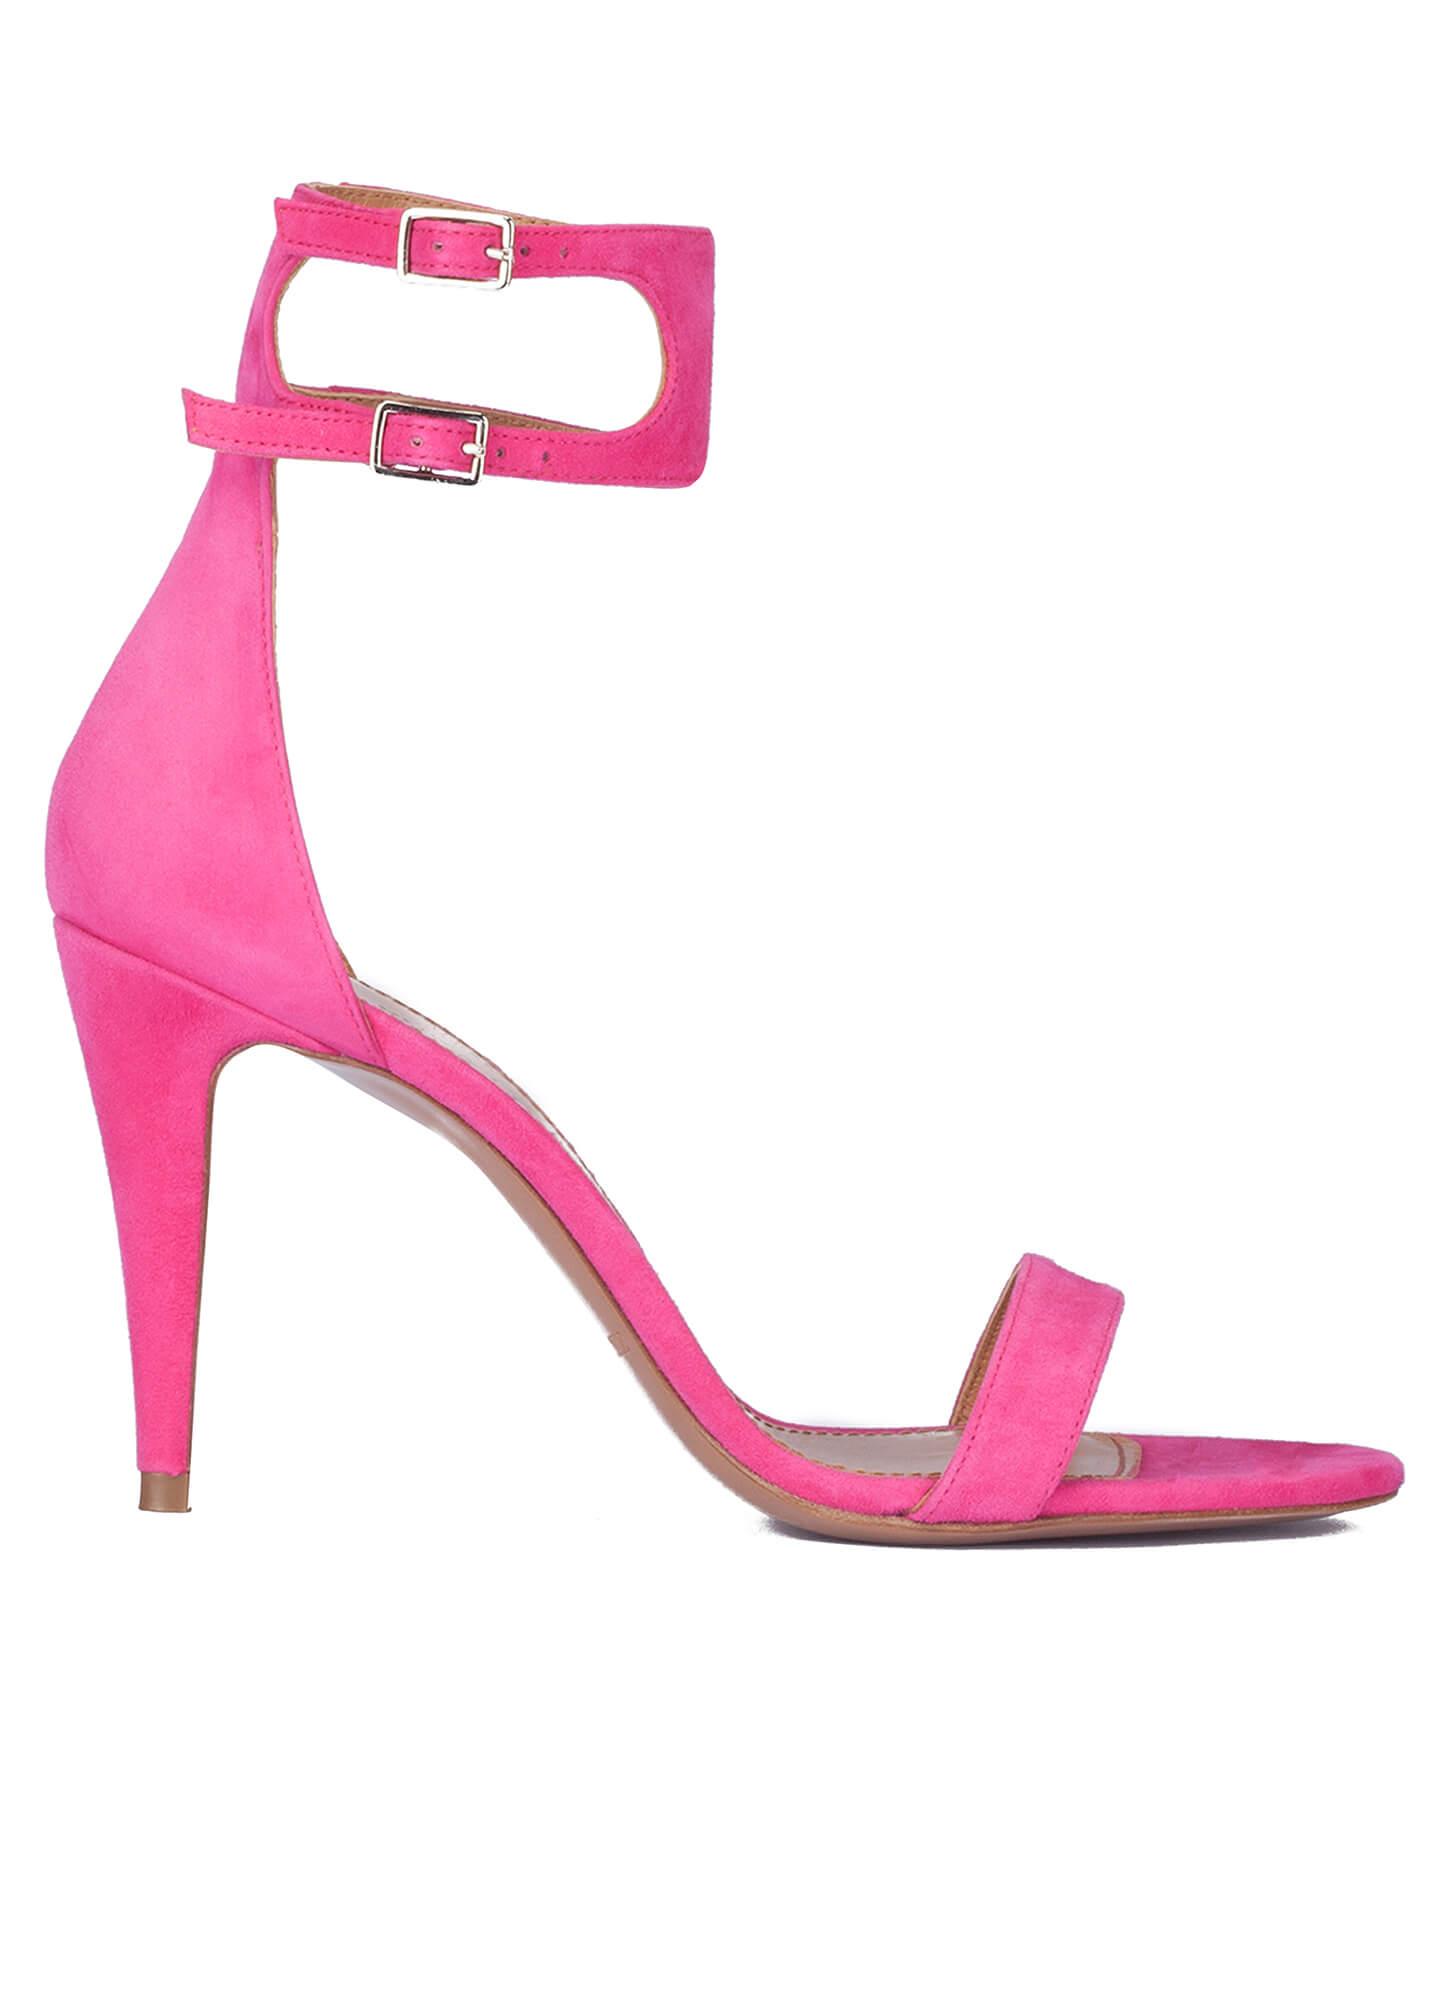 c1b62fa4b10a5 Sandalias fuxia de tacón alto - tienda de zapatos Pura López . PURA ...